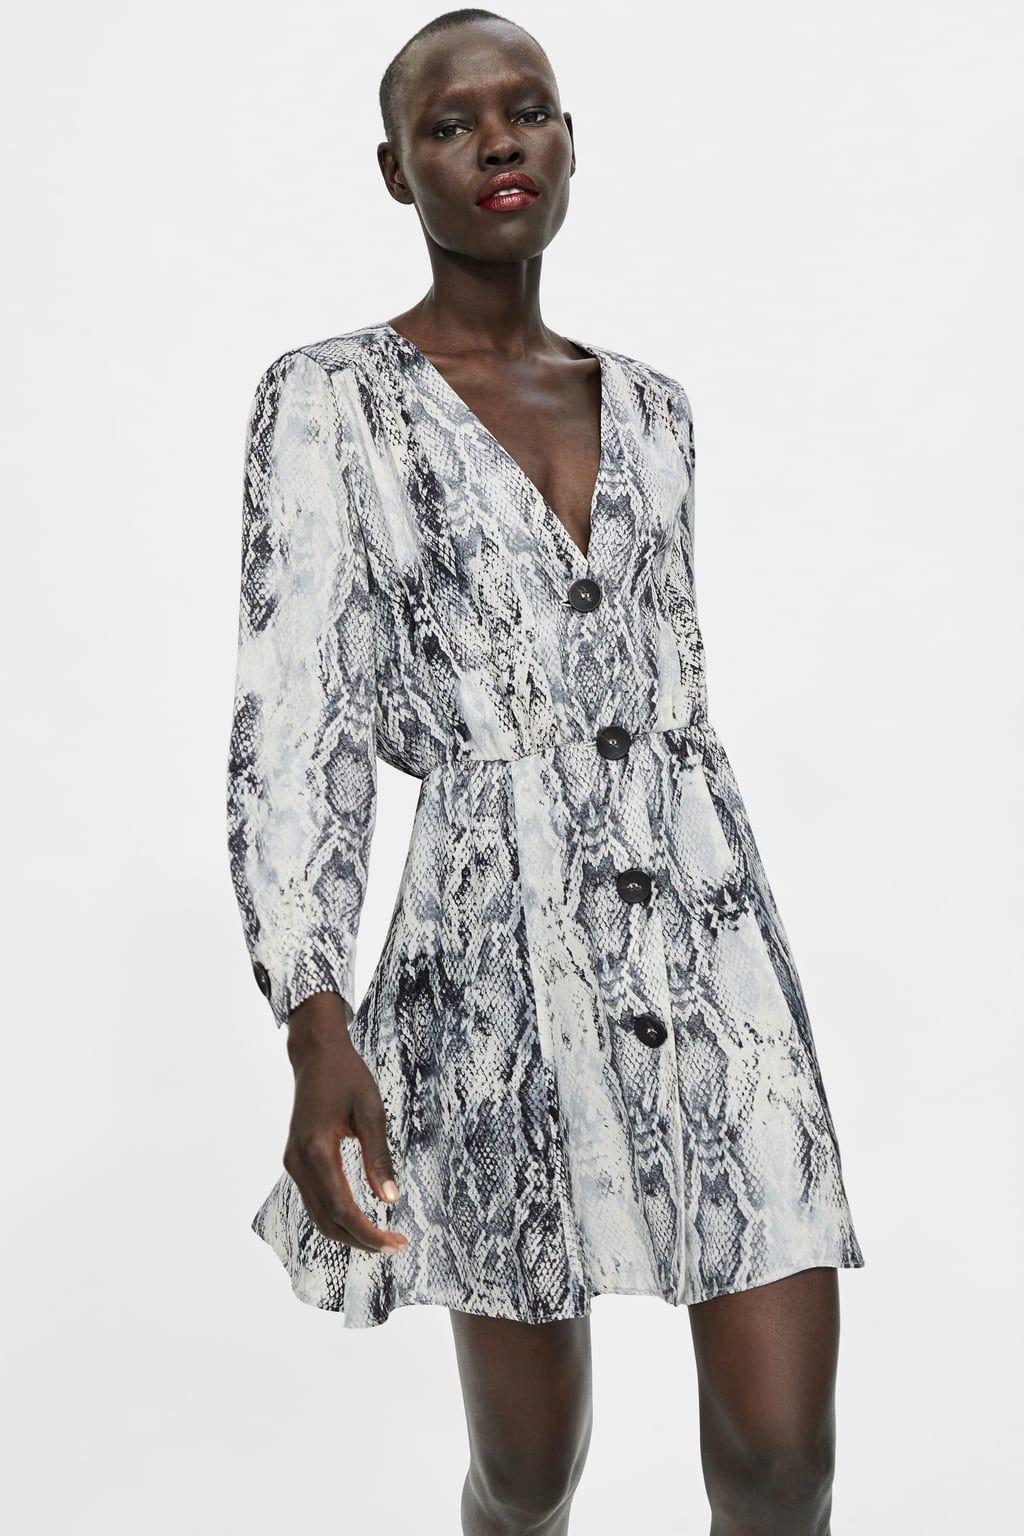 a4dfd3a0c45a Image 2 of ANIMAL PRINT DRESS from Zara | DRESSES | Animal print ...